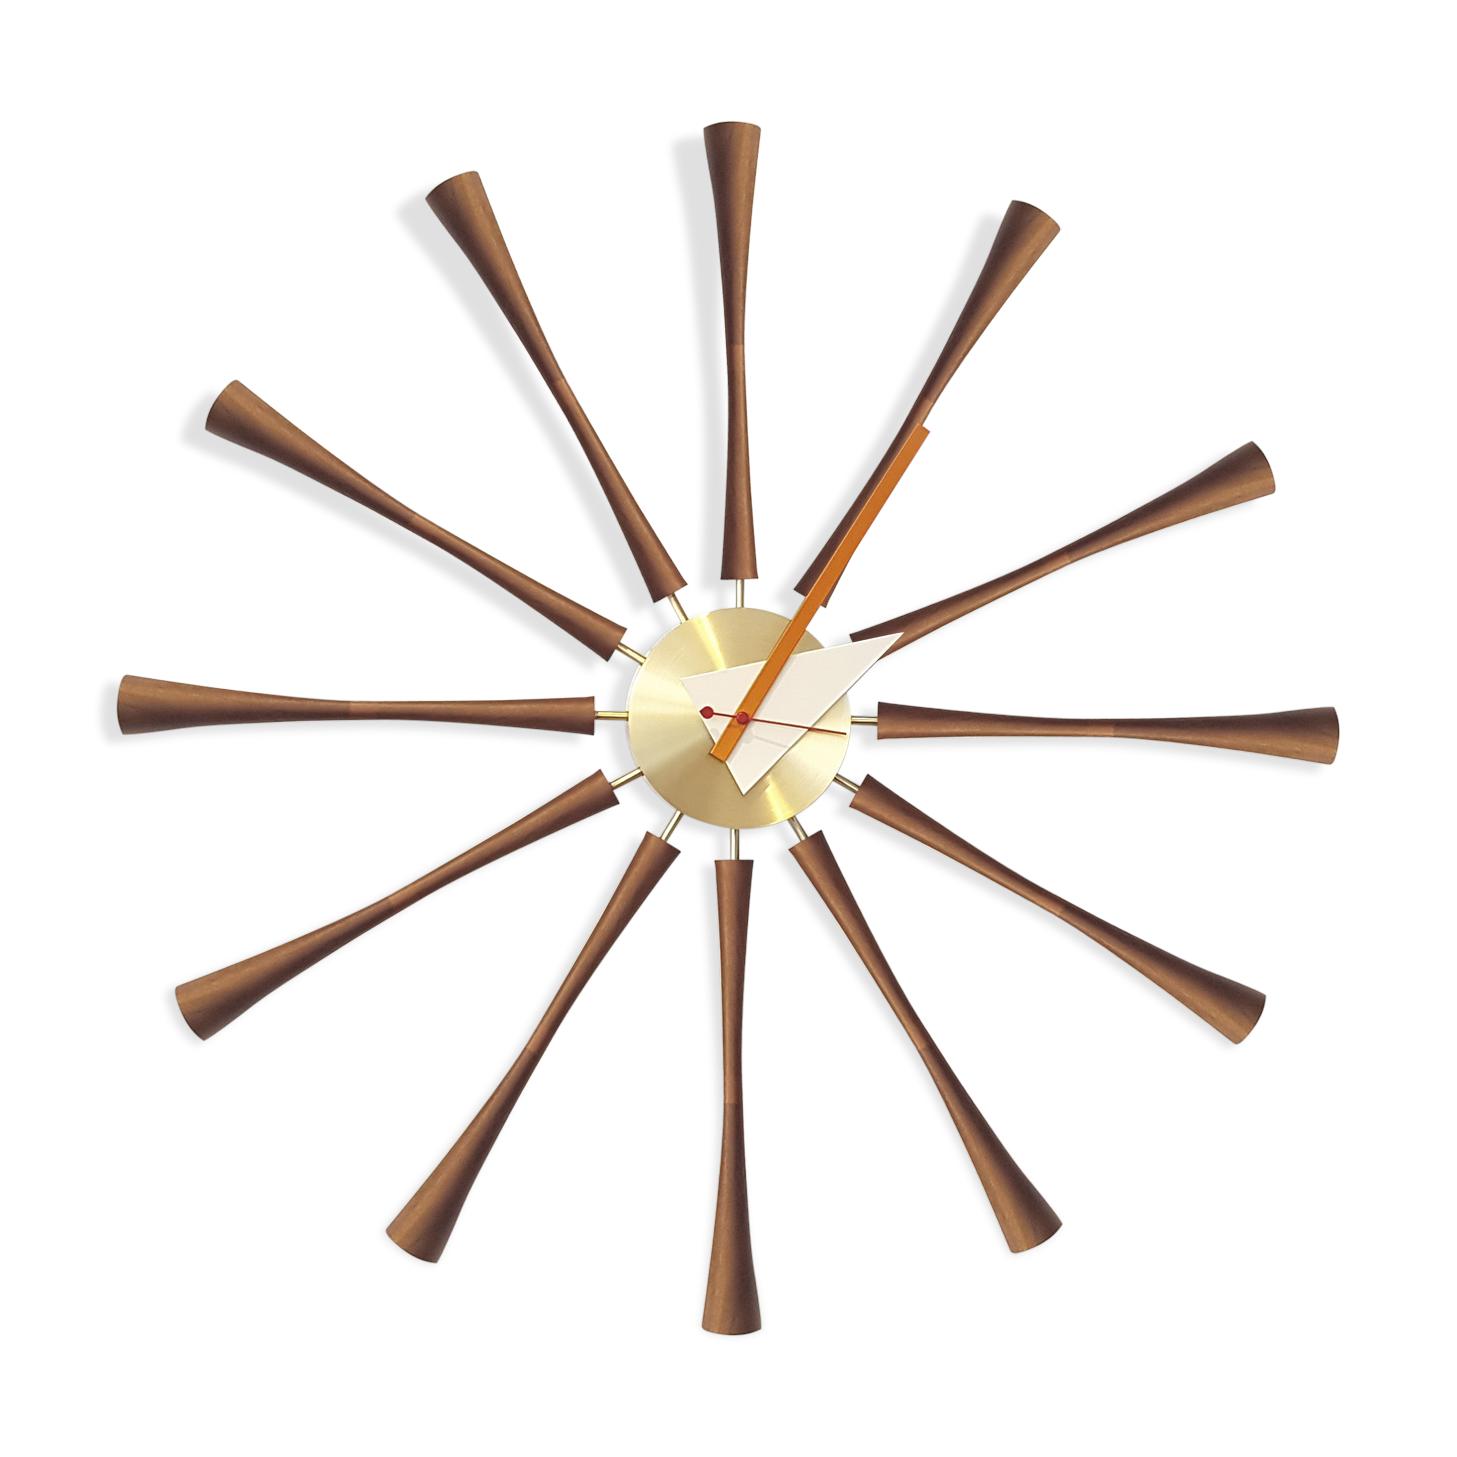 horloge george nelson pour vitra - laiton - marron - design - 6ncjd2n